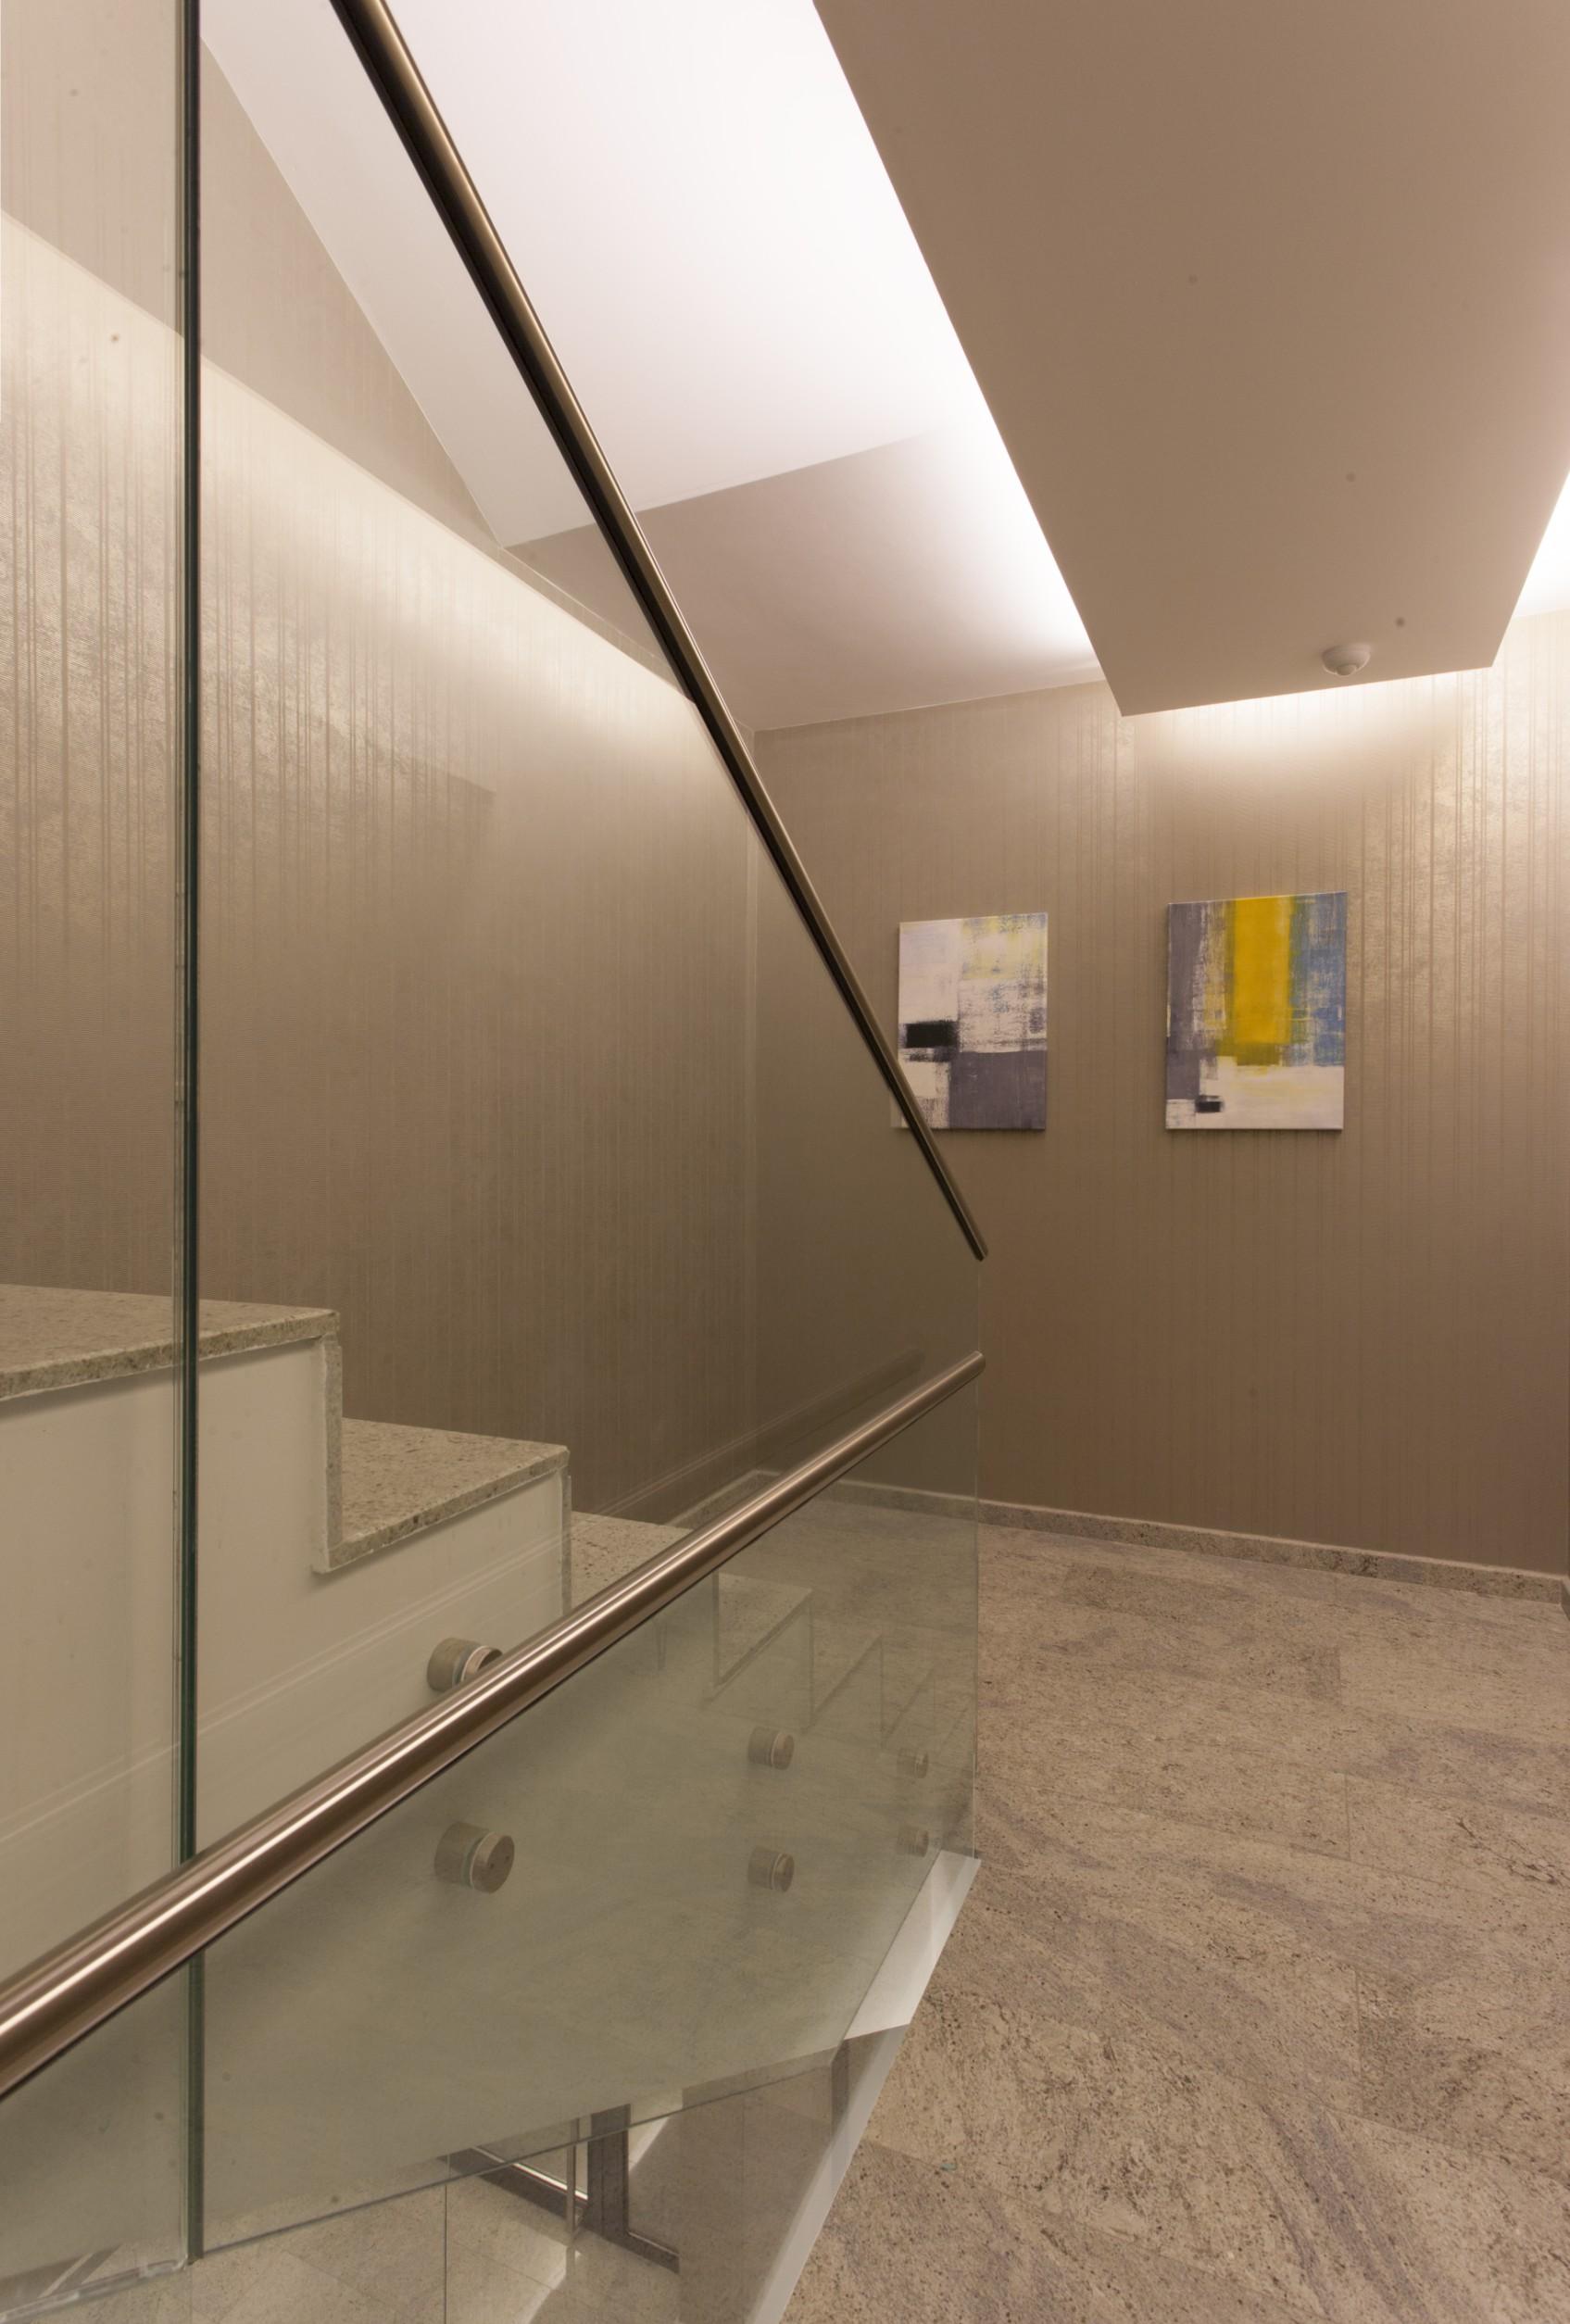 https://nbc-arhitect.ro/wp-content/uploads/2020/10/NBC-Arhitect-_-Petofi-Sandor-_-Housing-_-interior-design_stairs_4.jpg